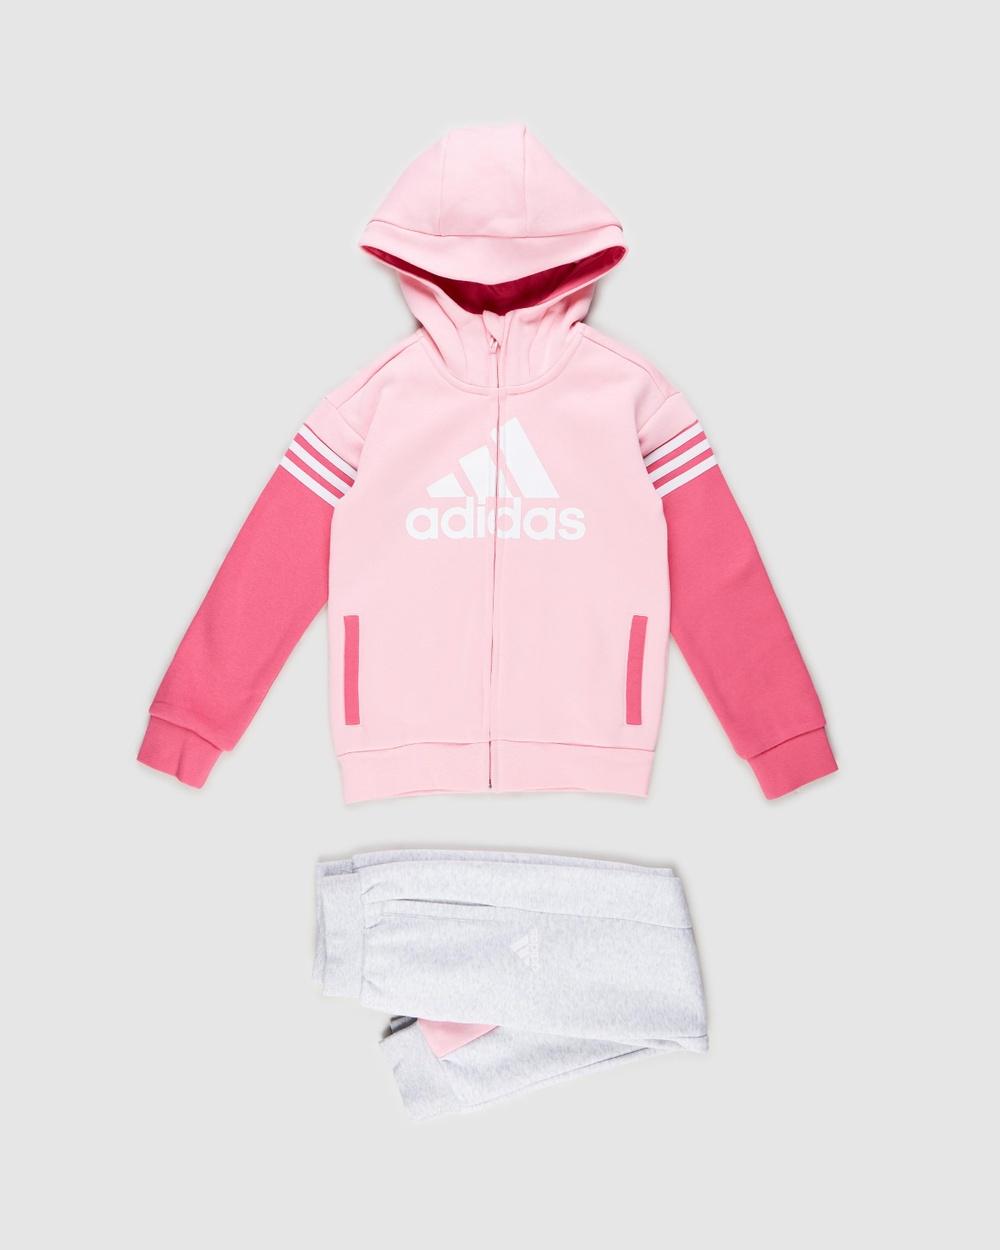 adidas Performance Badge of Sport Fleece Set Kids Hoodies Light Pink & Light Grey Heather